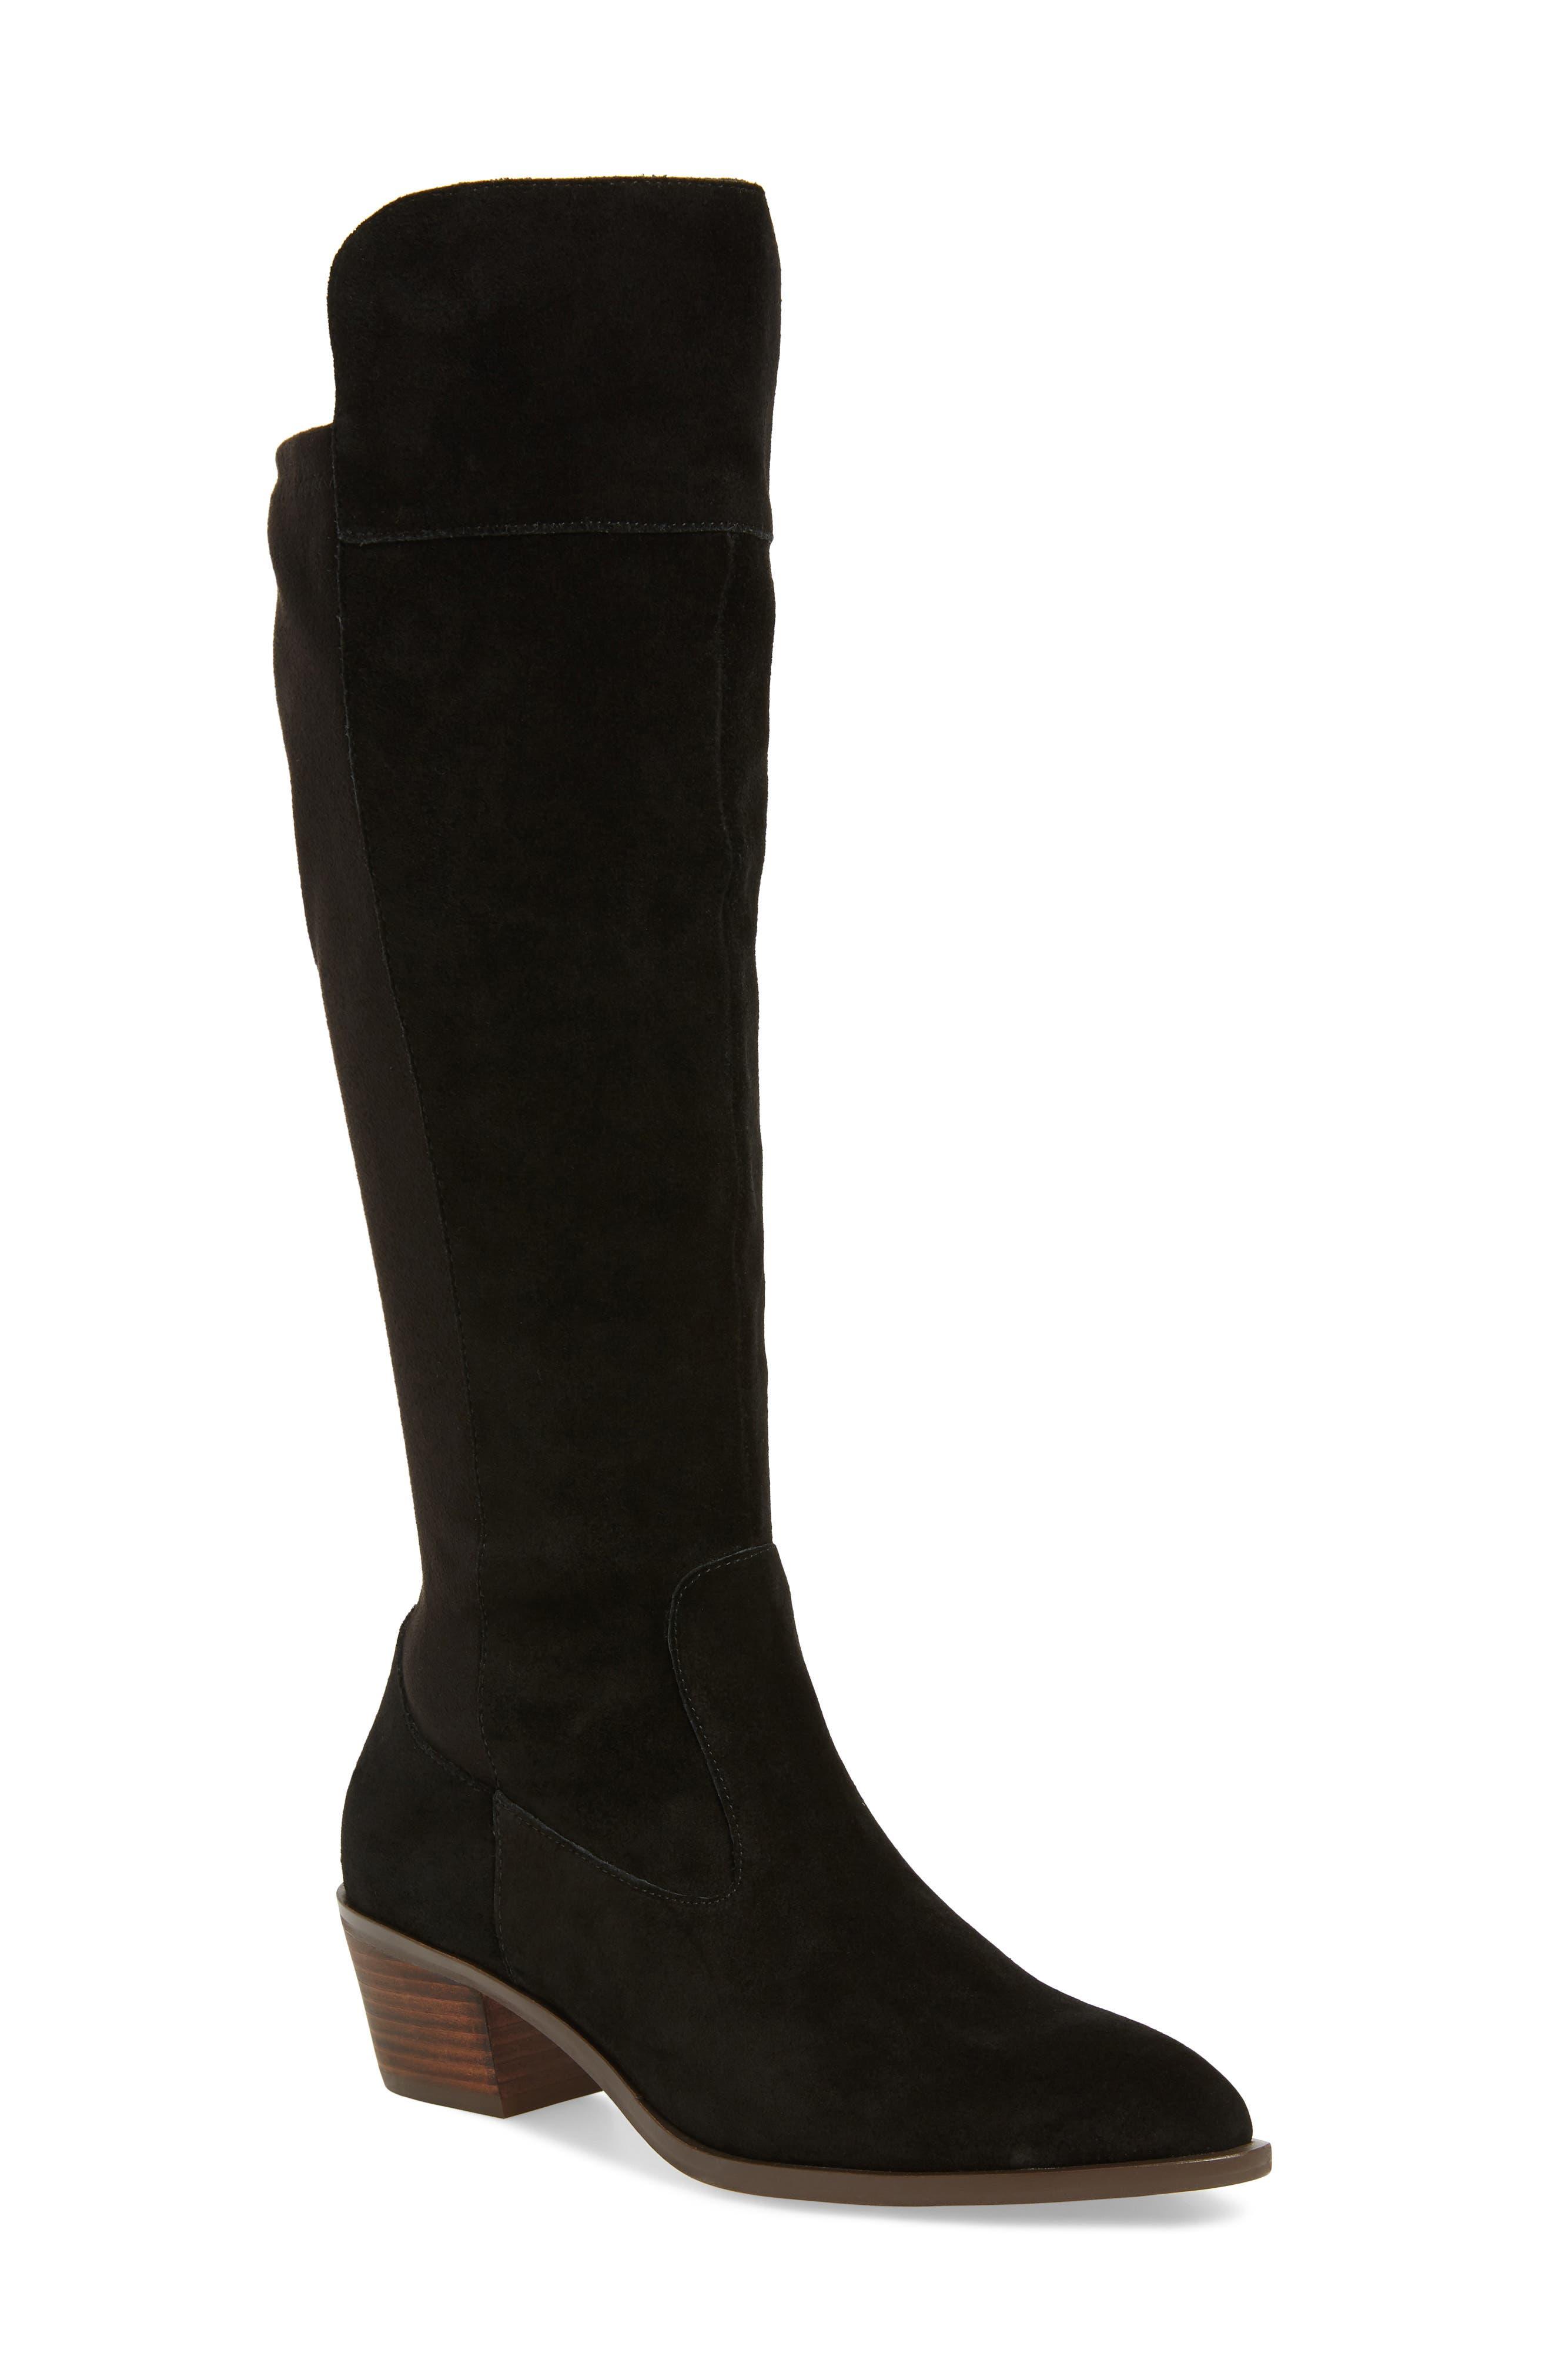 Noamie Knee High Boot,                             Main thumbnail 1, color,                             BLACK SUEDE